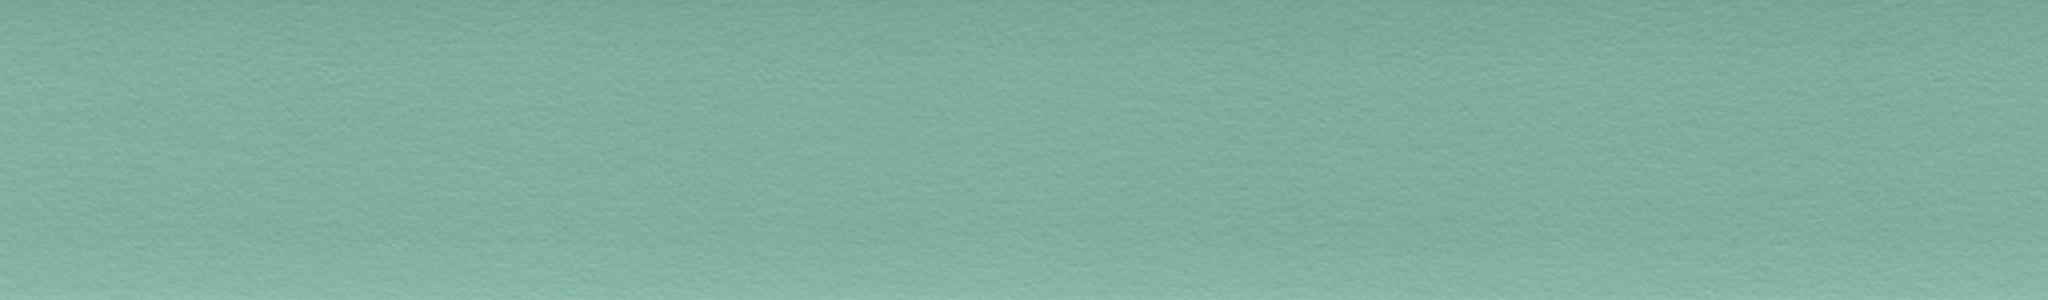 HU 169007 ABS Edge Green Soft Pearl 107